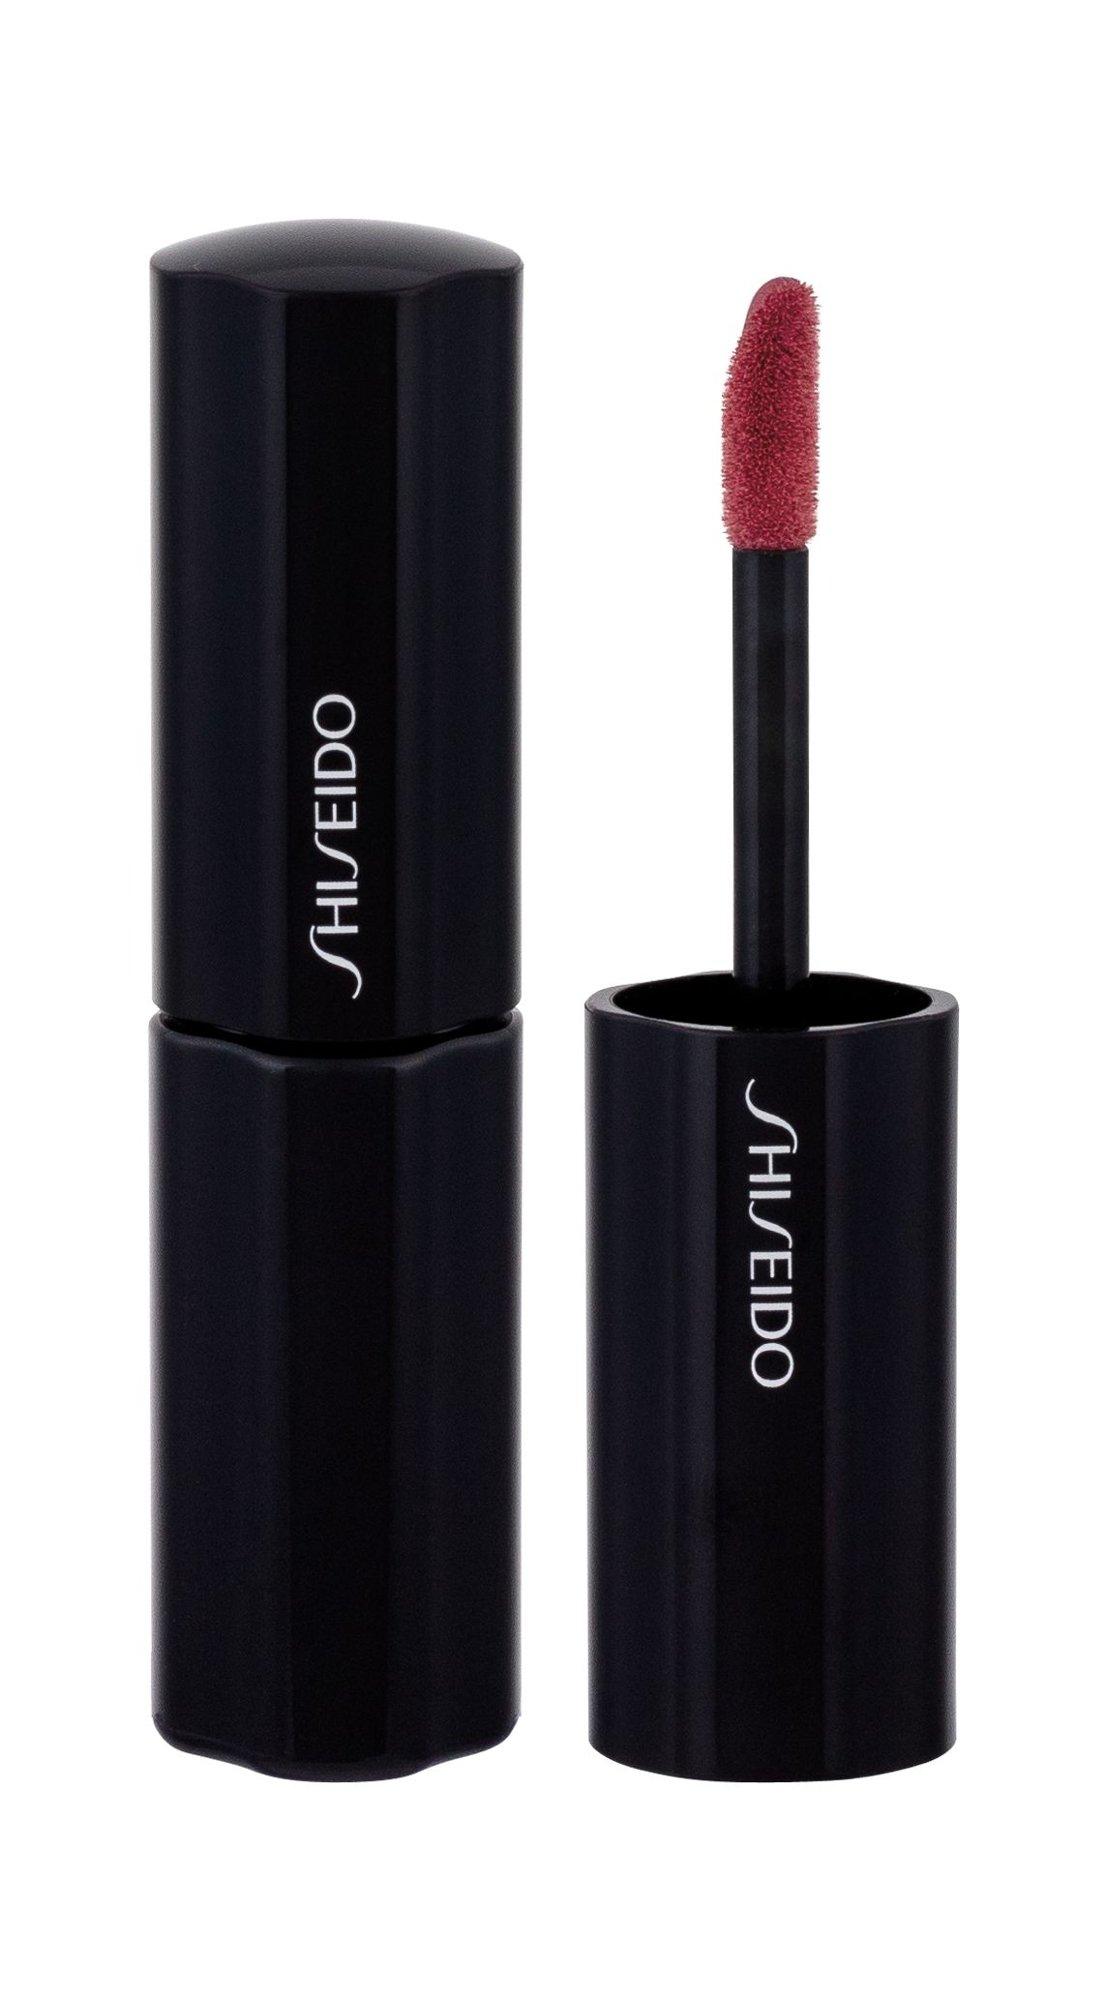 Shiseido Lacquer Rouge Lipstick 6ml RD215